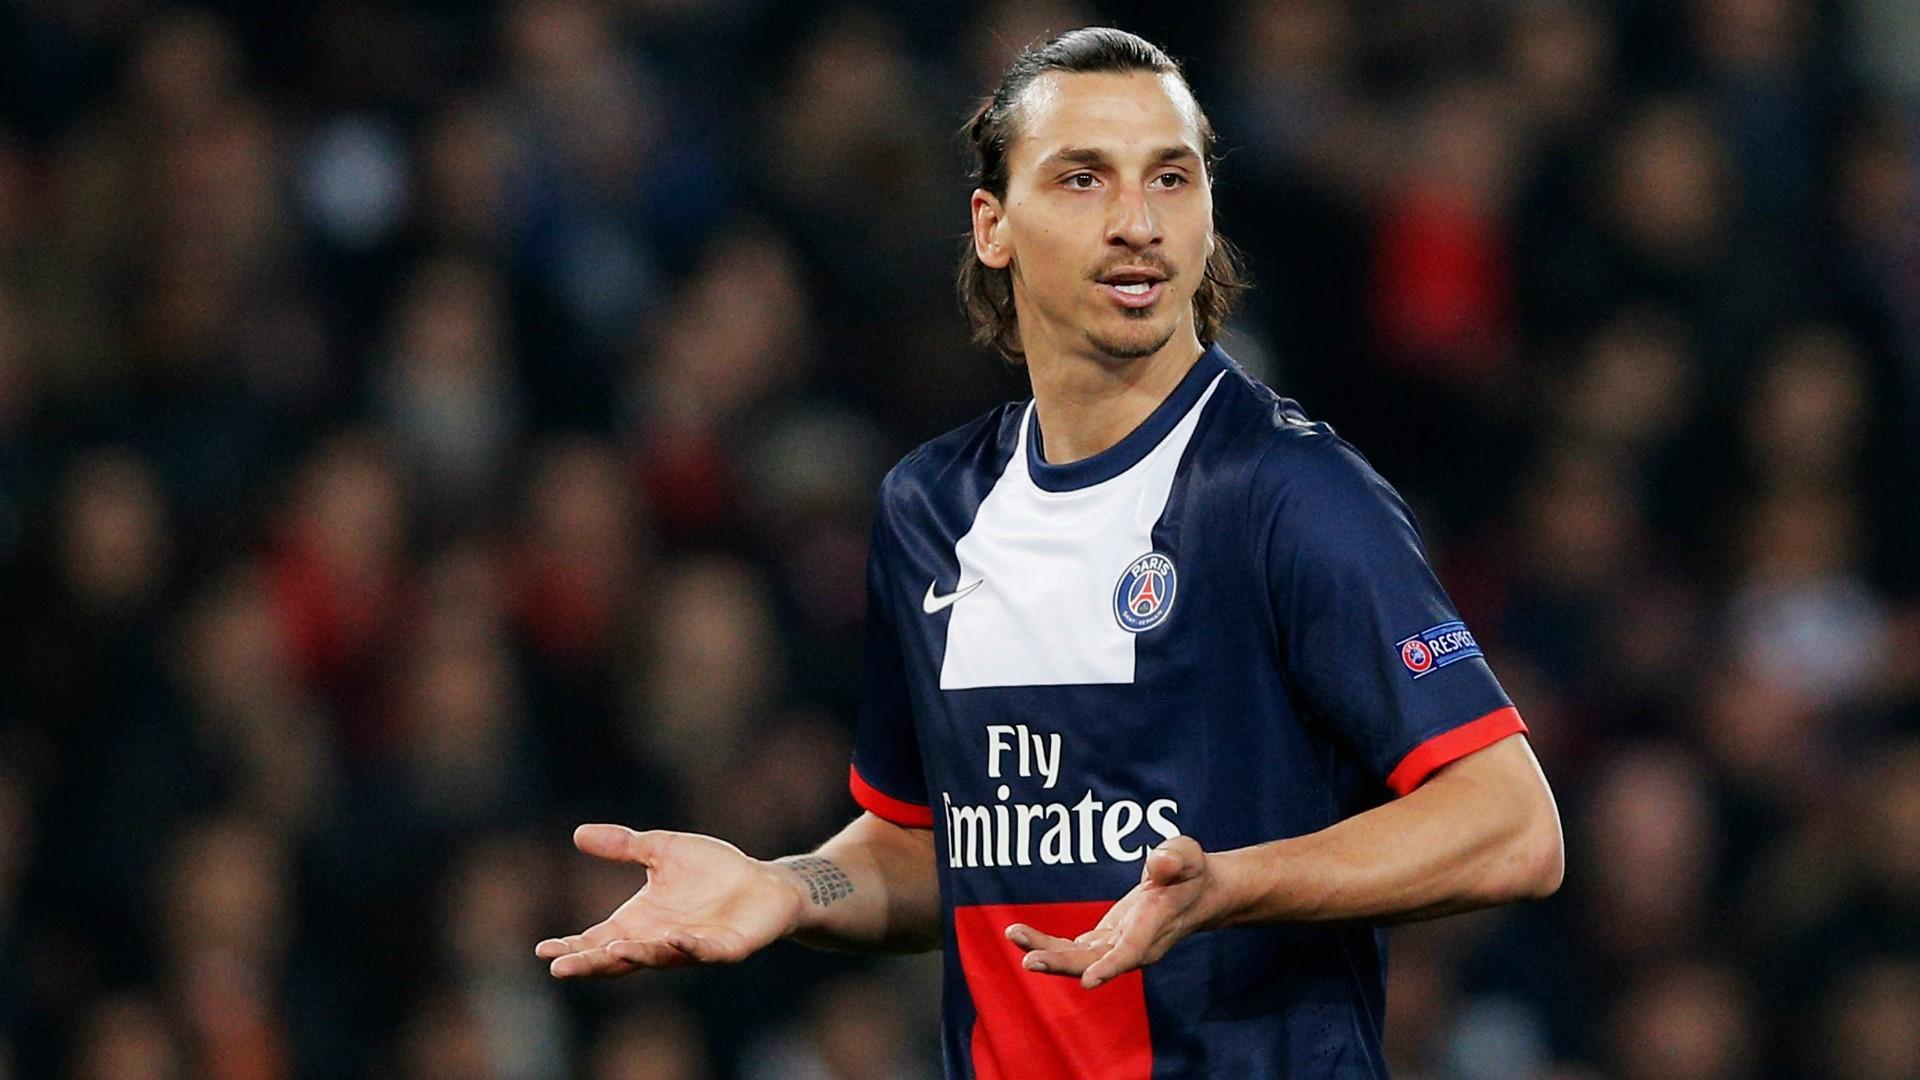 Zlatan Ibrahimovic 9